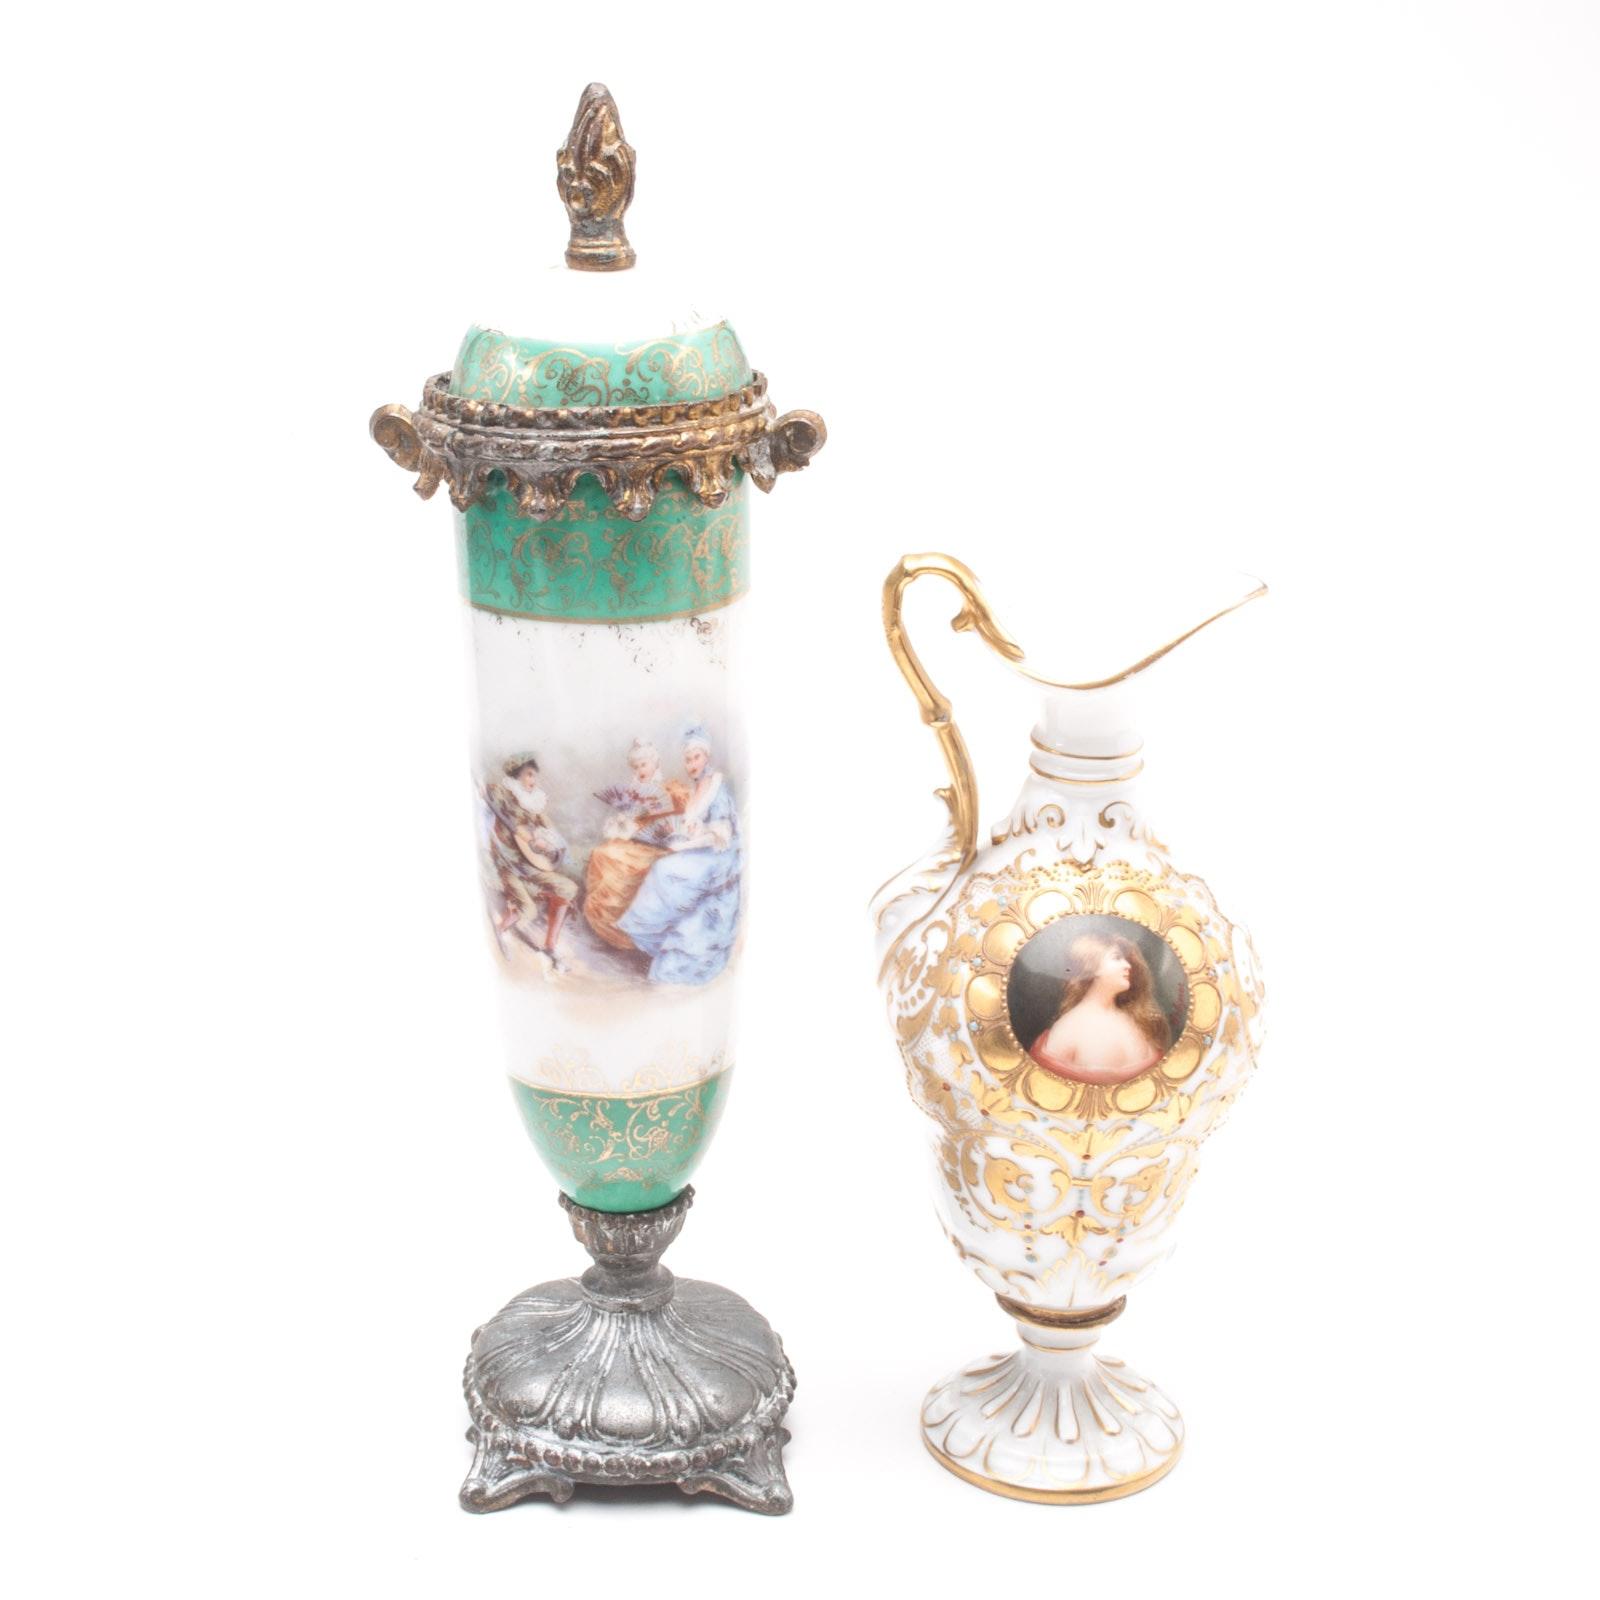 Decorative Decor Items